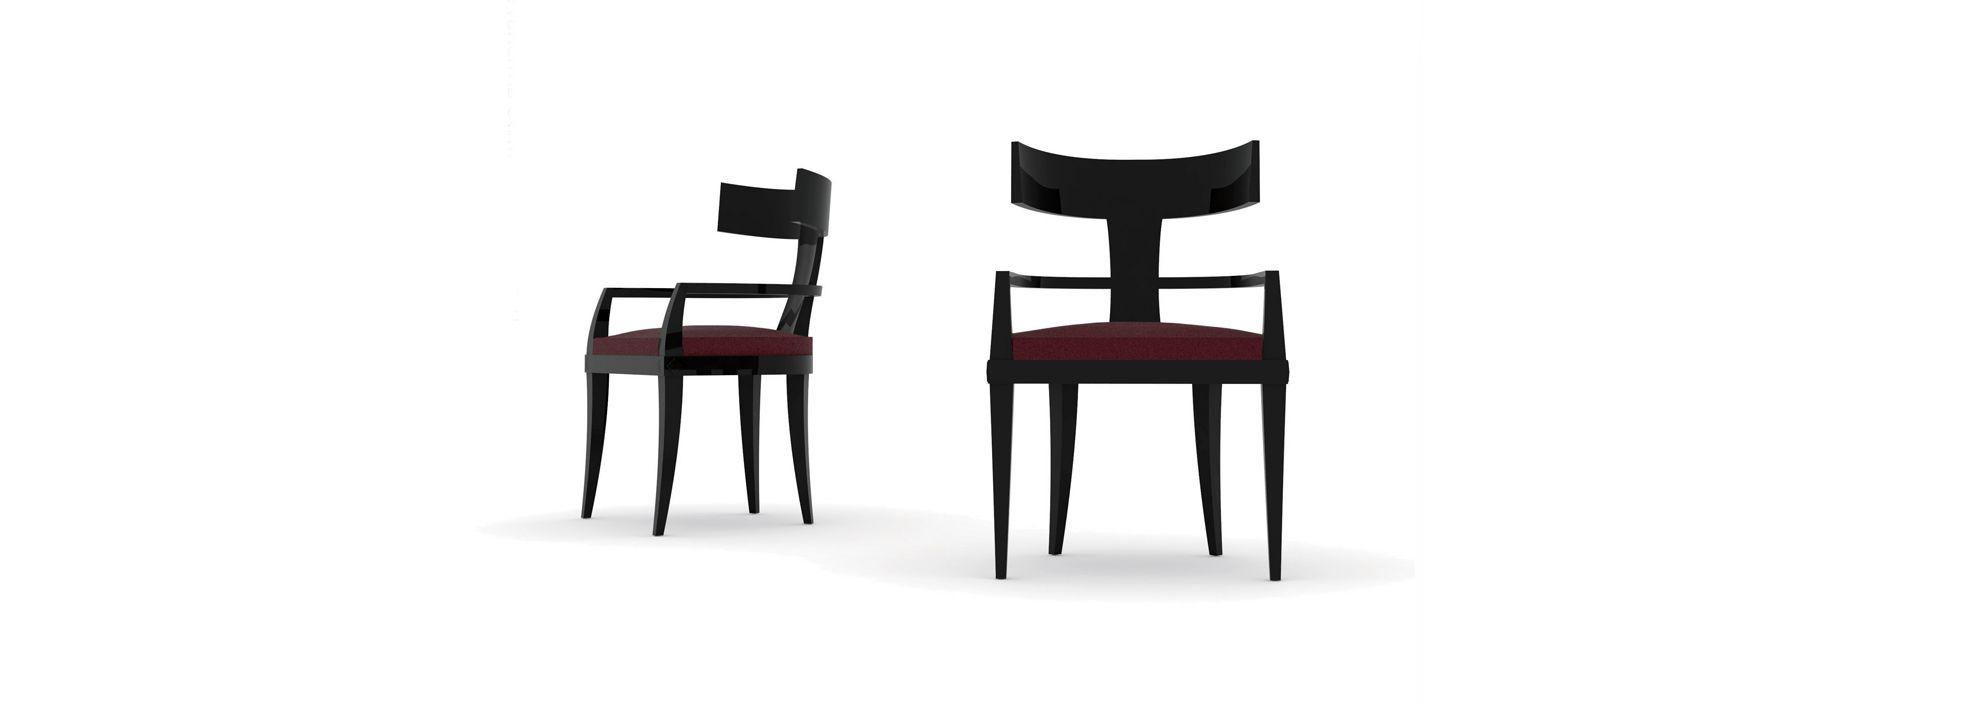 Randolph Furniture Furniture Table Styles